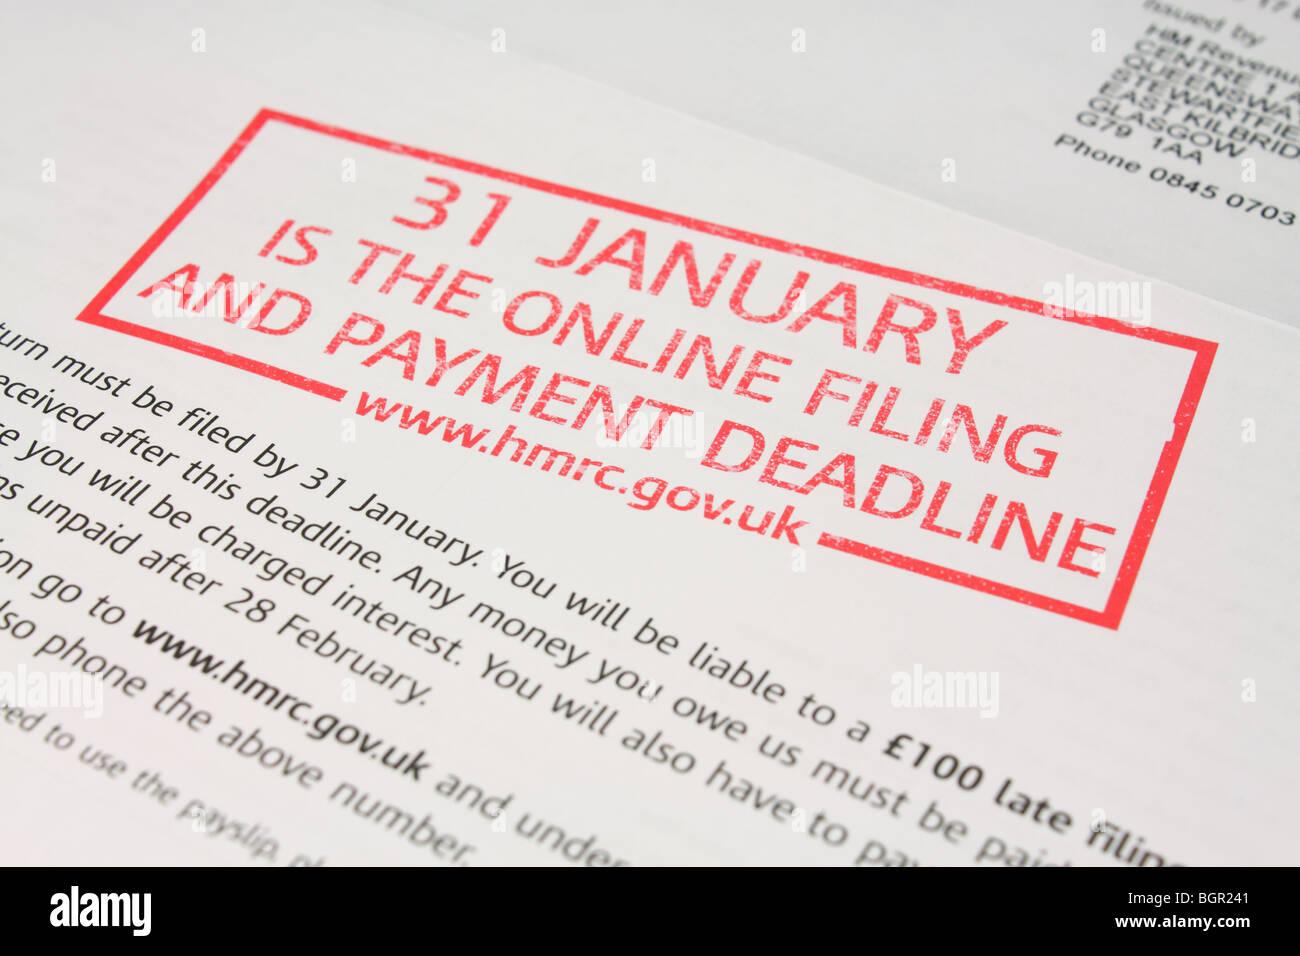 Reminder Letter From Hmrc For Filing Of Selfassessment Tax Return